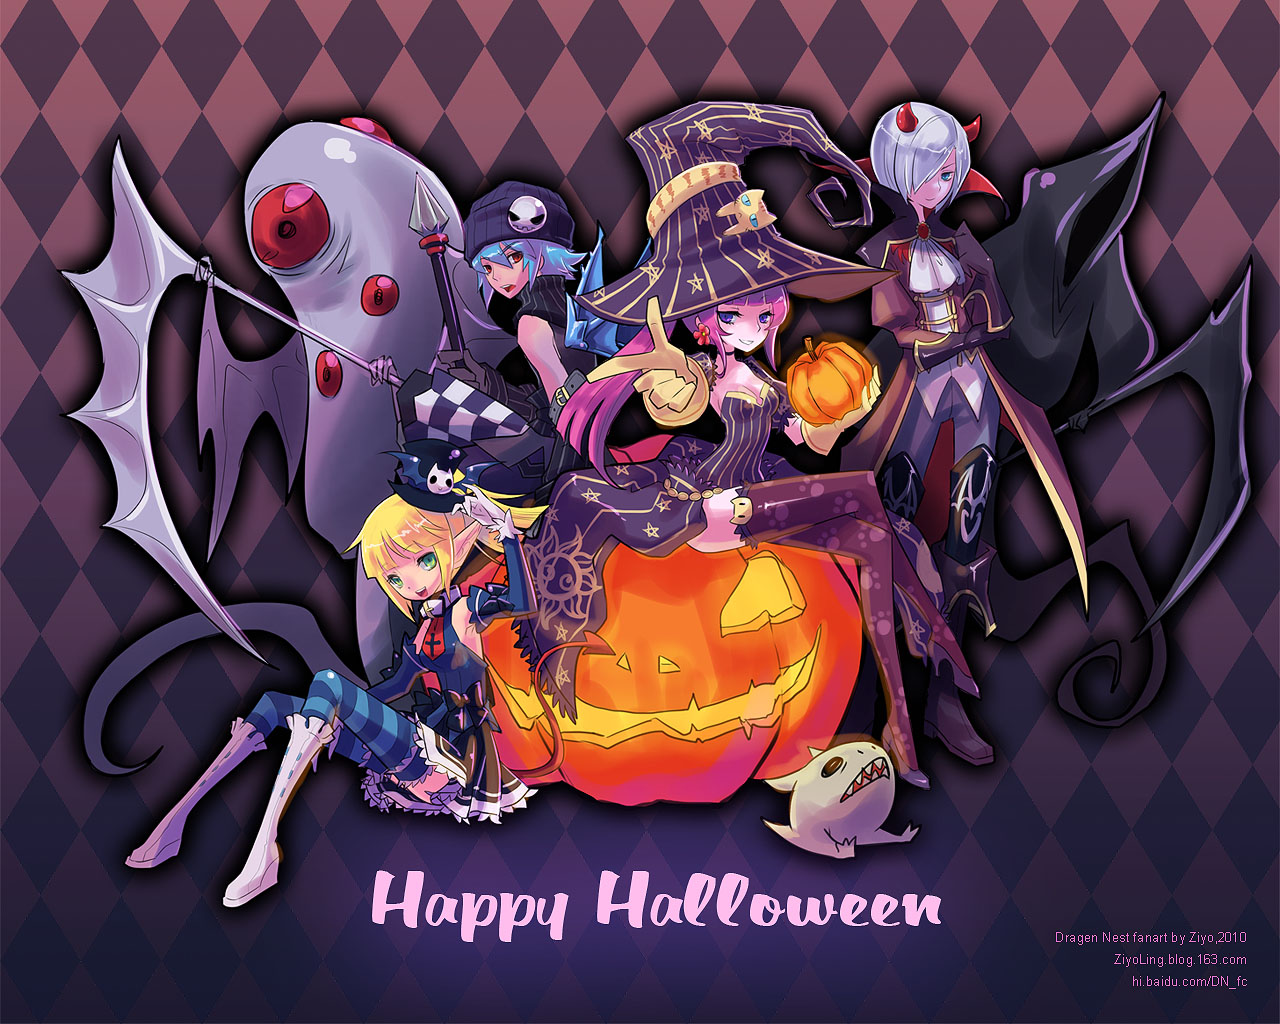 Happy Halloween 2010 by ZiyoLing